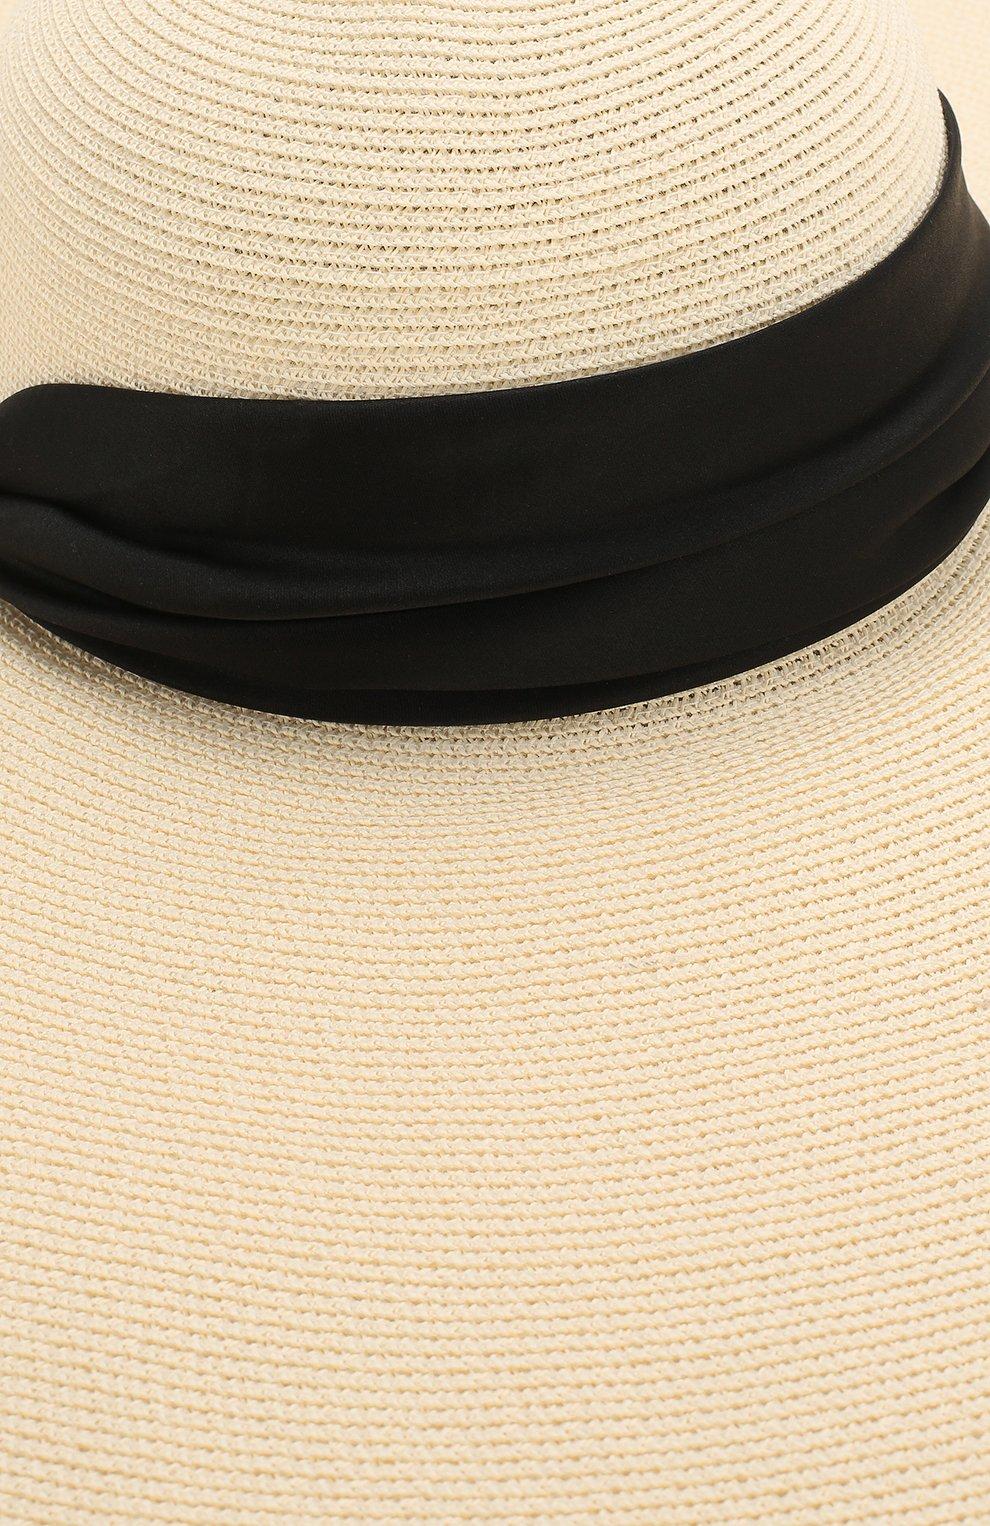 Шляпа Veruschka Eugenia Kim кремвого цвета | Фото №3